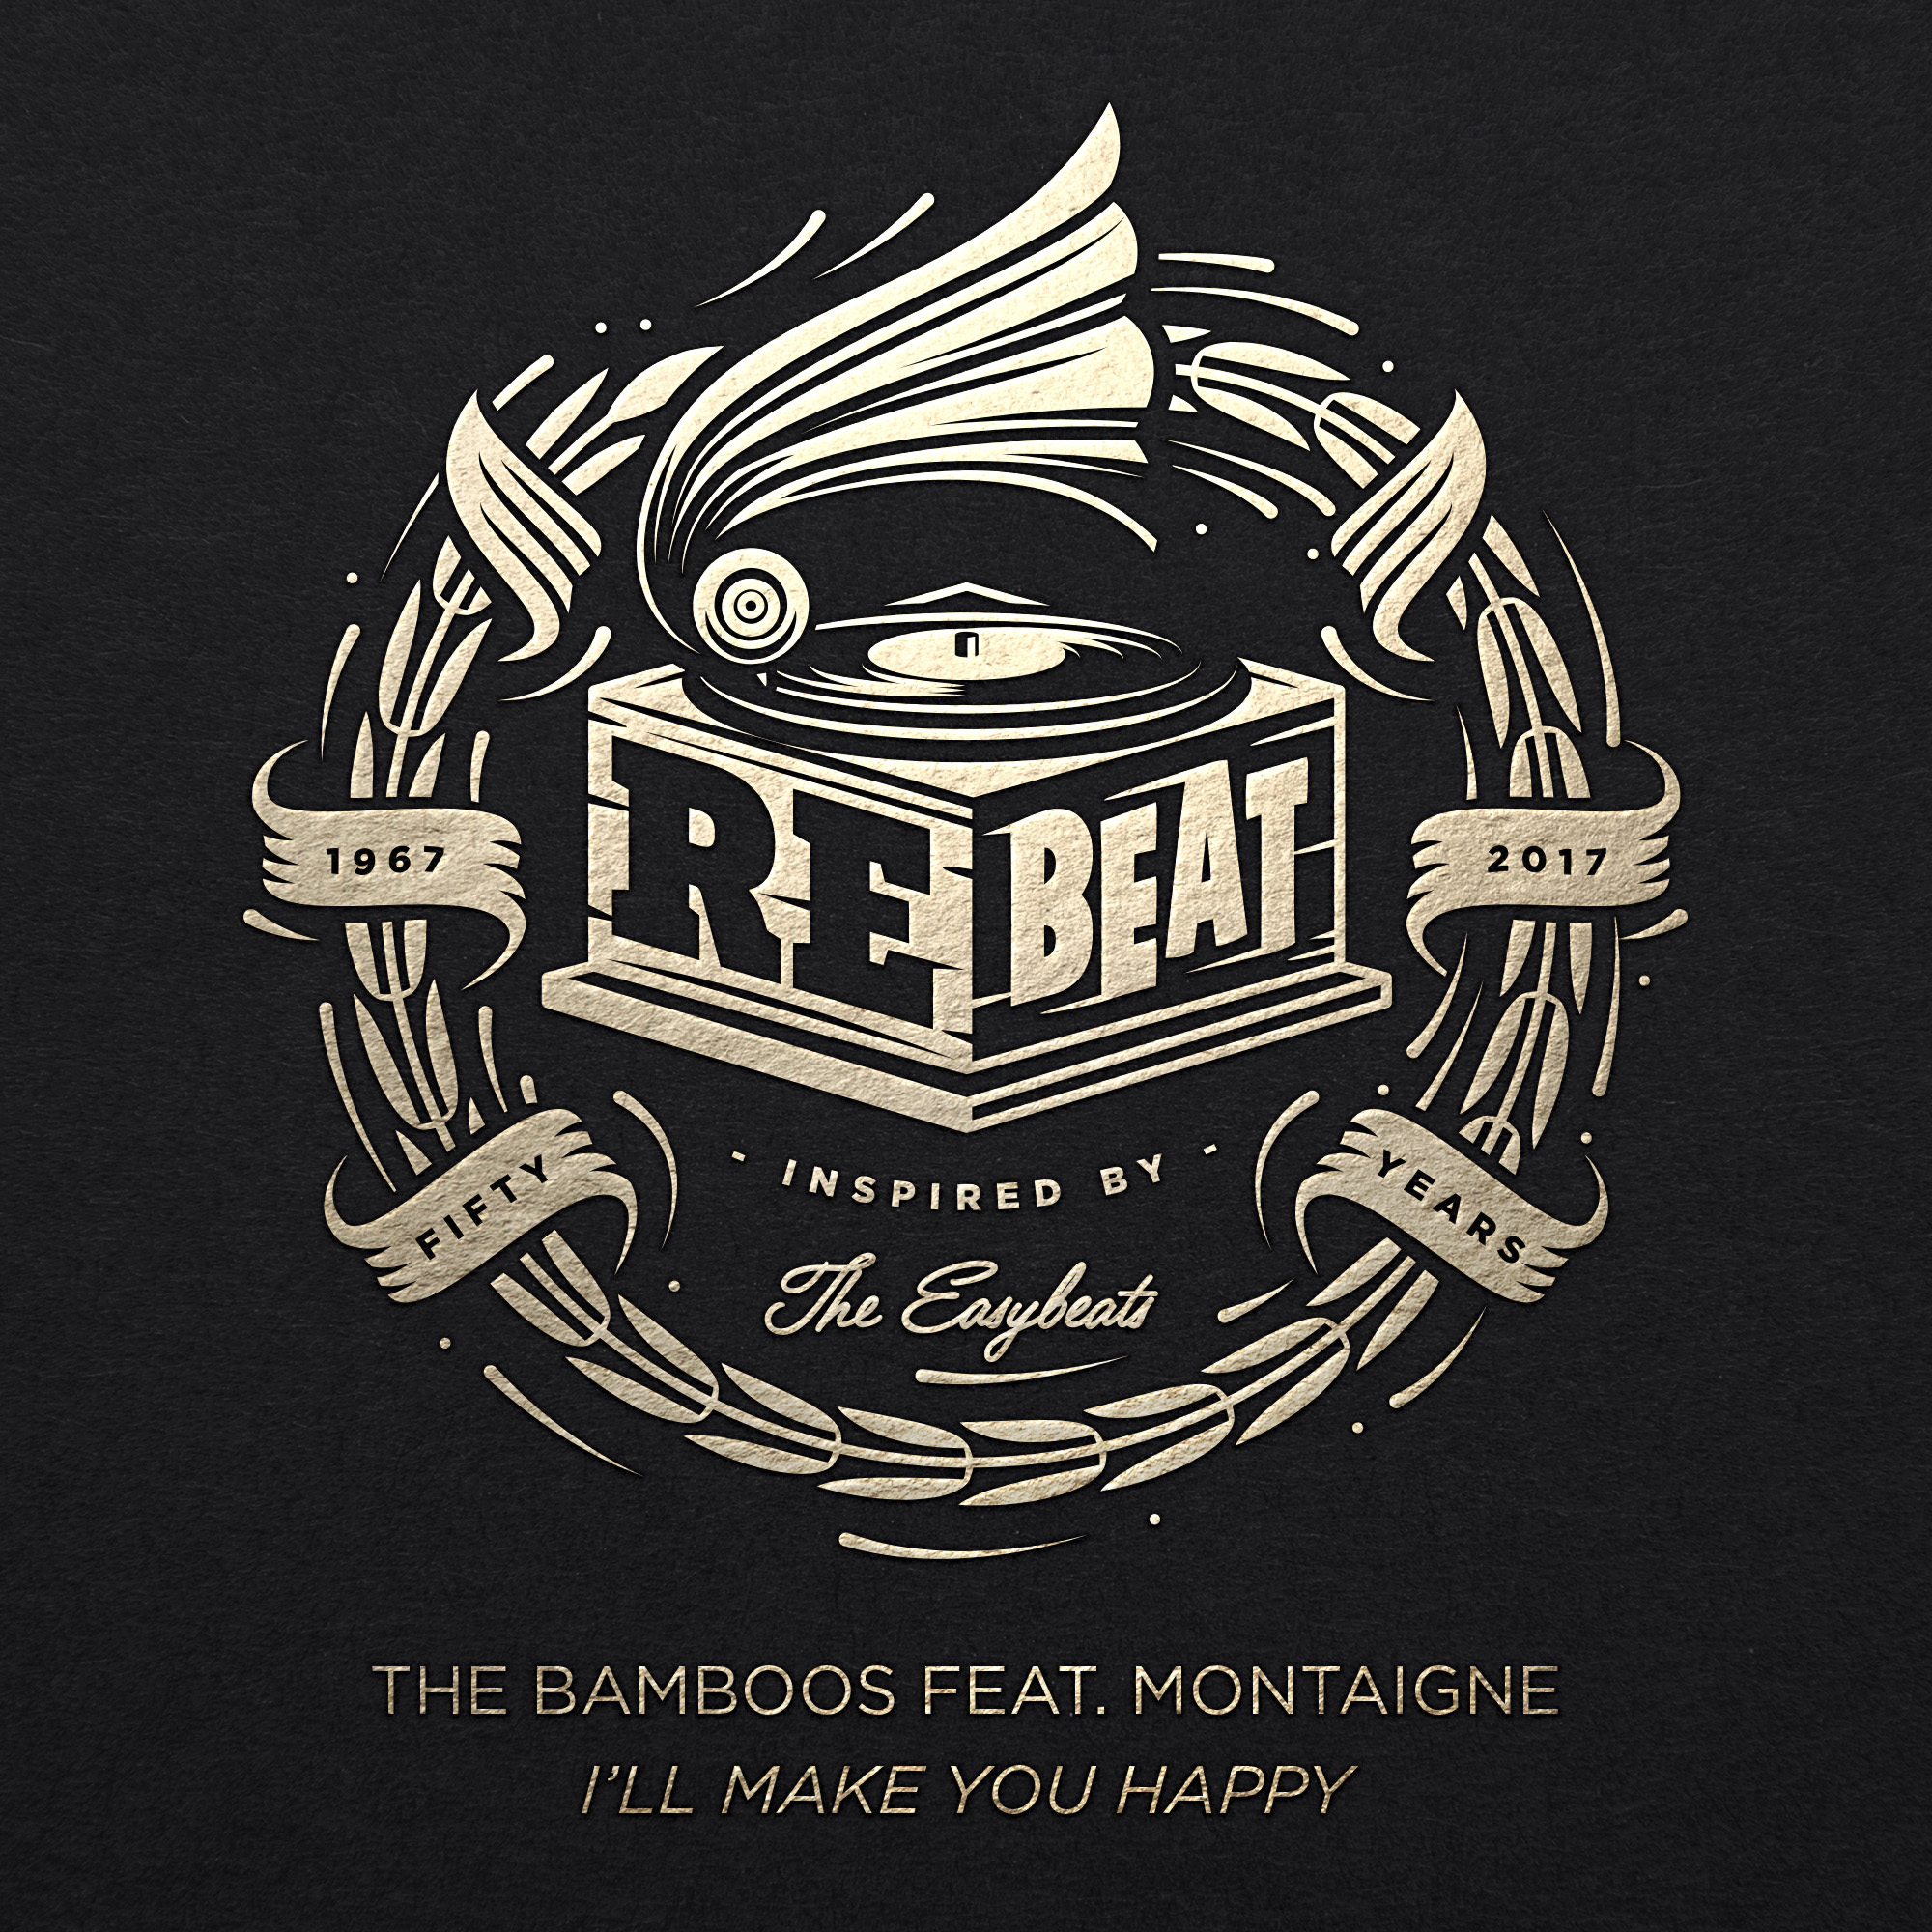 rebeat_bamboos.jpeg